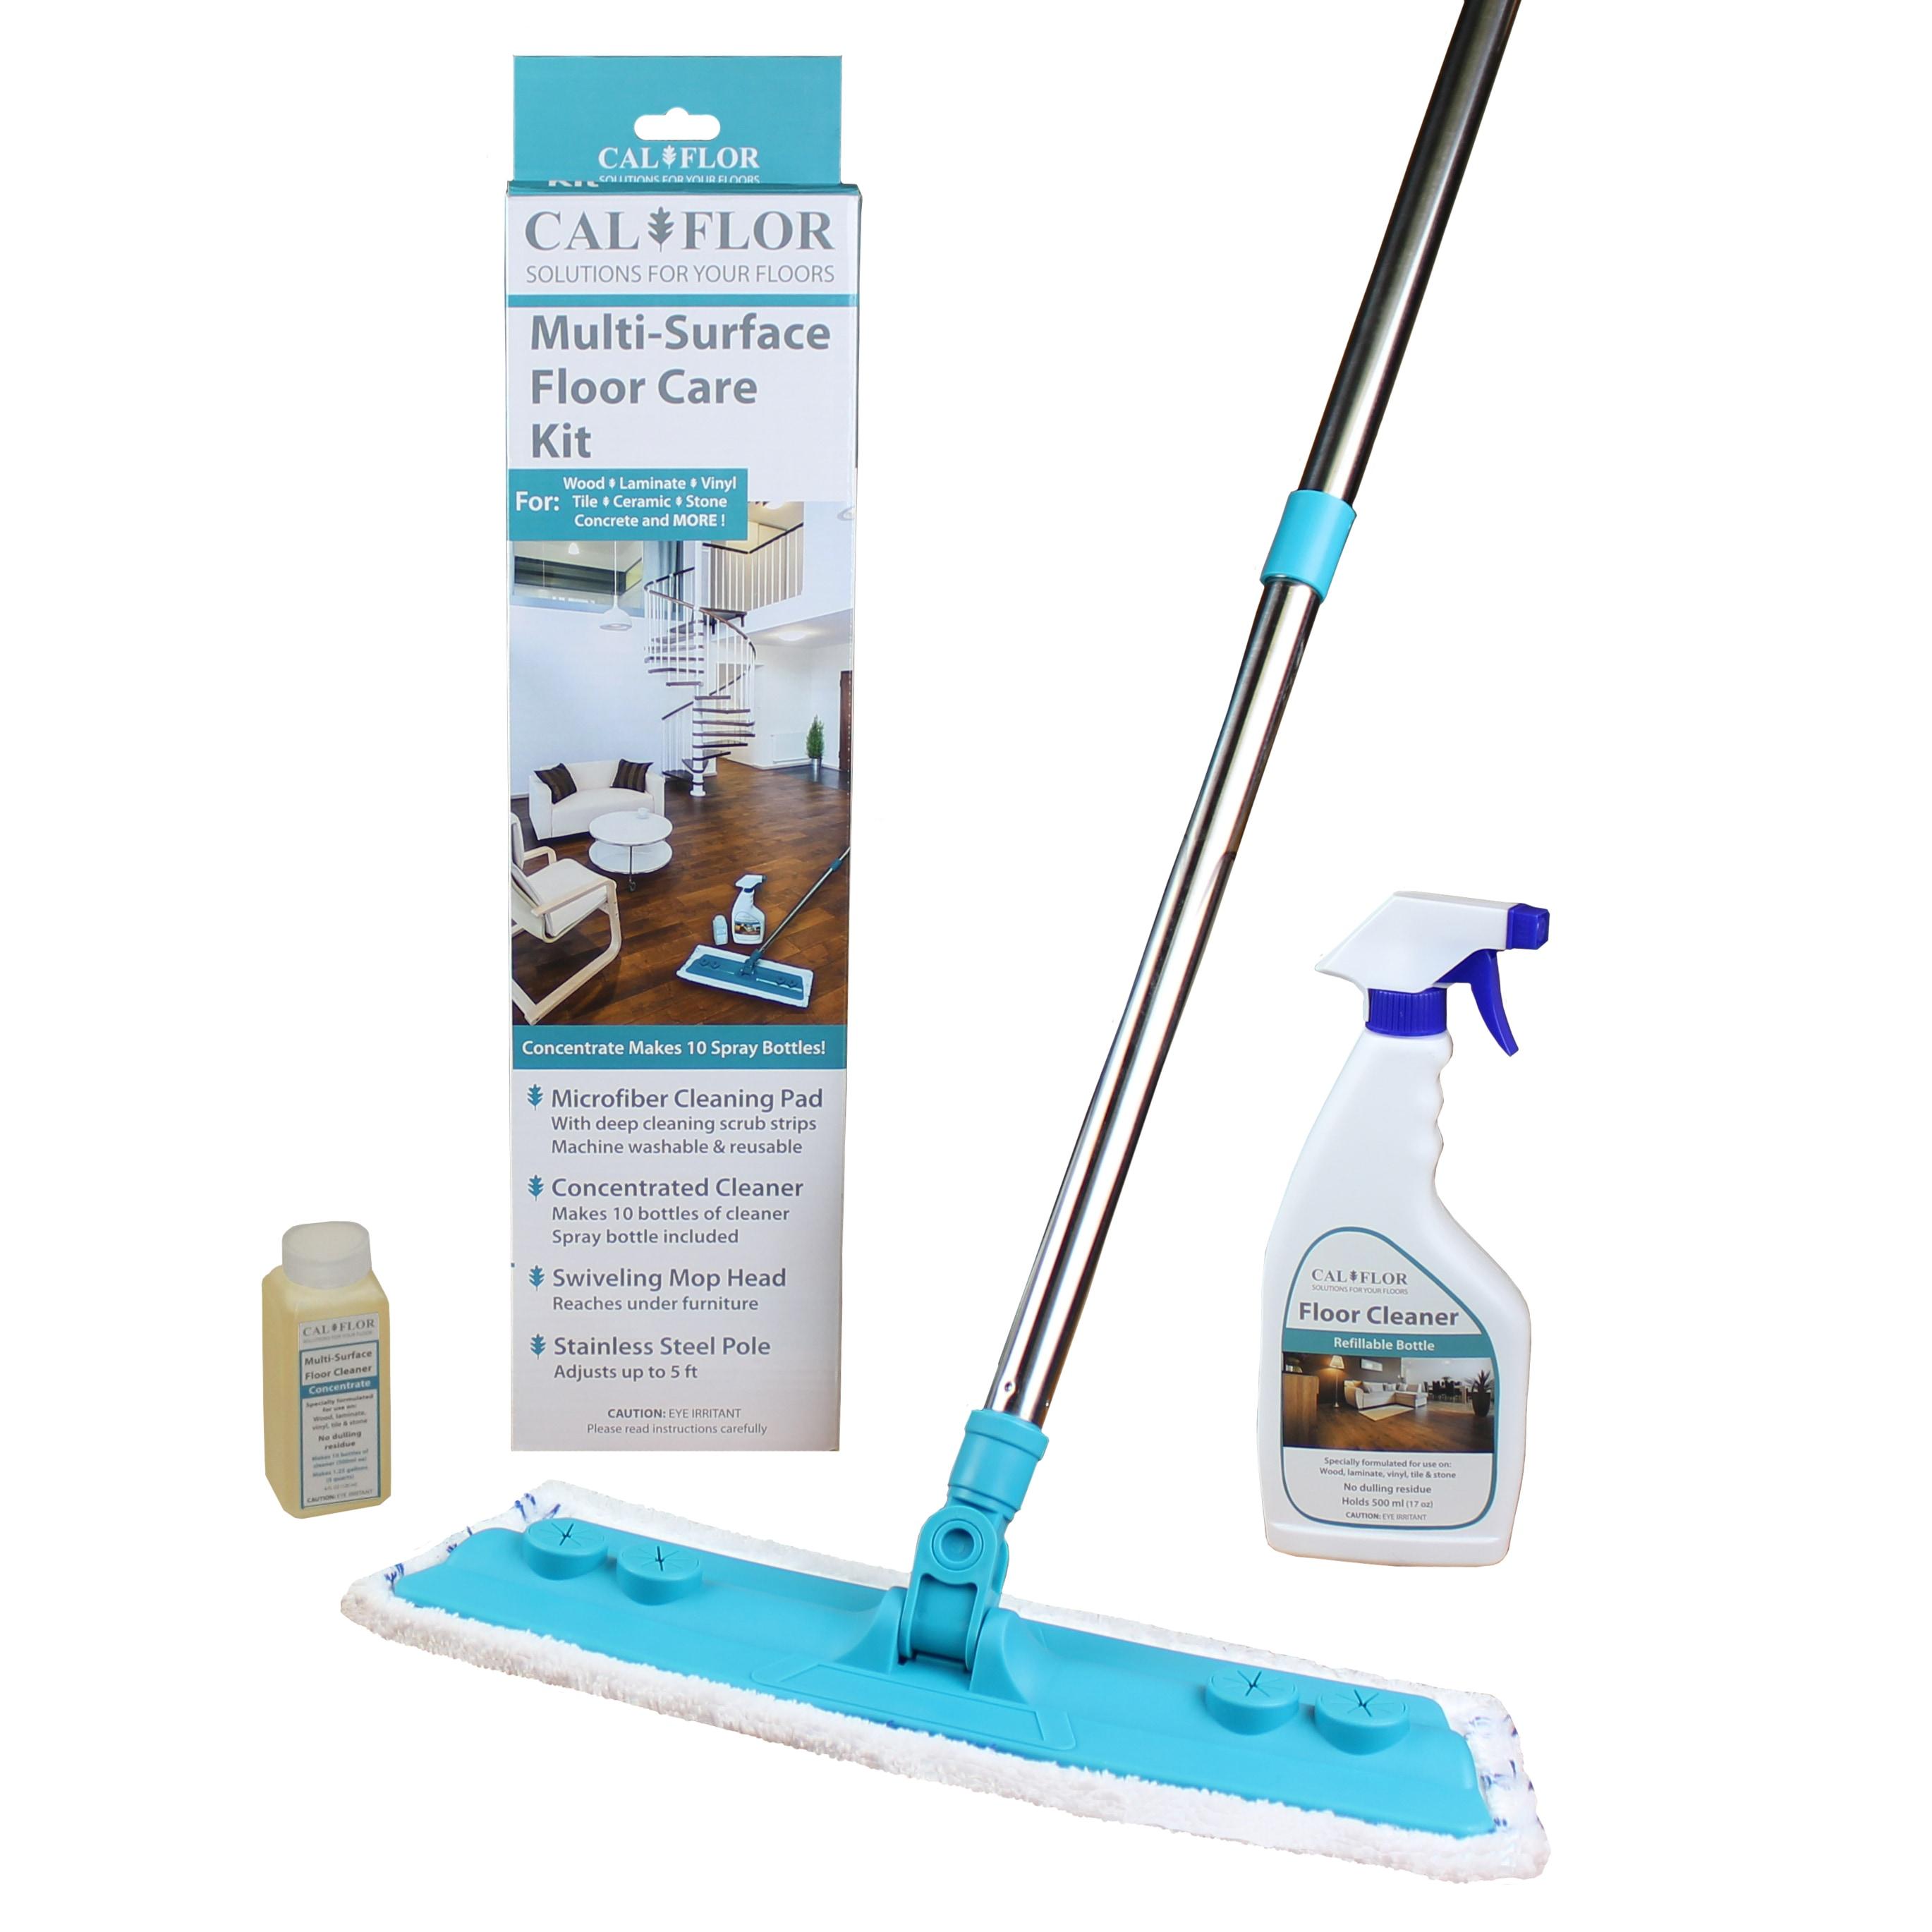 Ceramic tile repair kit page 5 fallcreekonline 166hi0546winetile04 source cal flor multi surface floor care kit 5 piece set standard mop kit dailygadgetfo Choice Image